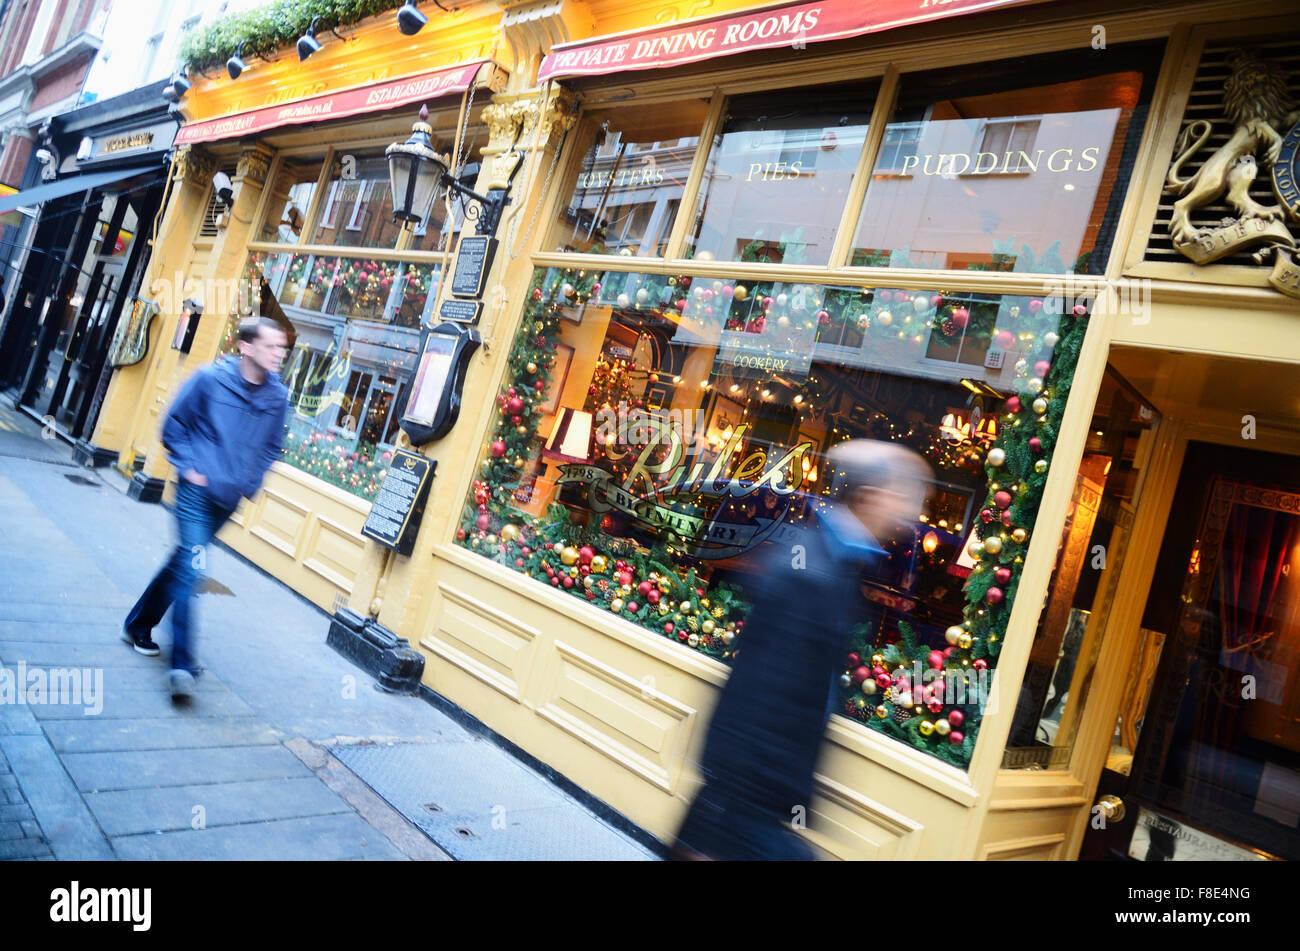 Regeln, bicentennial Restaurant. London, Vereinigtes Königreich Stockbild